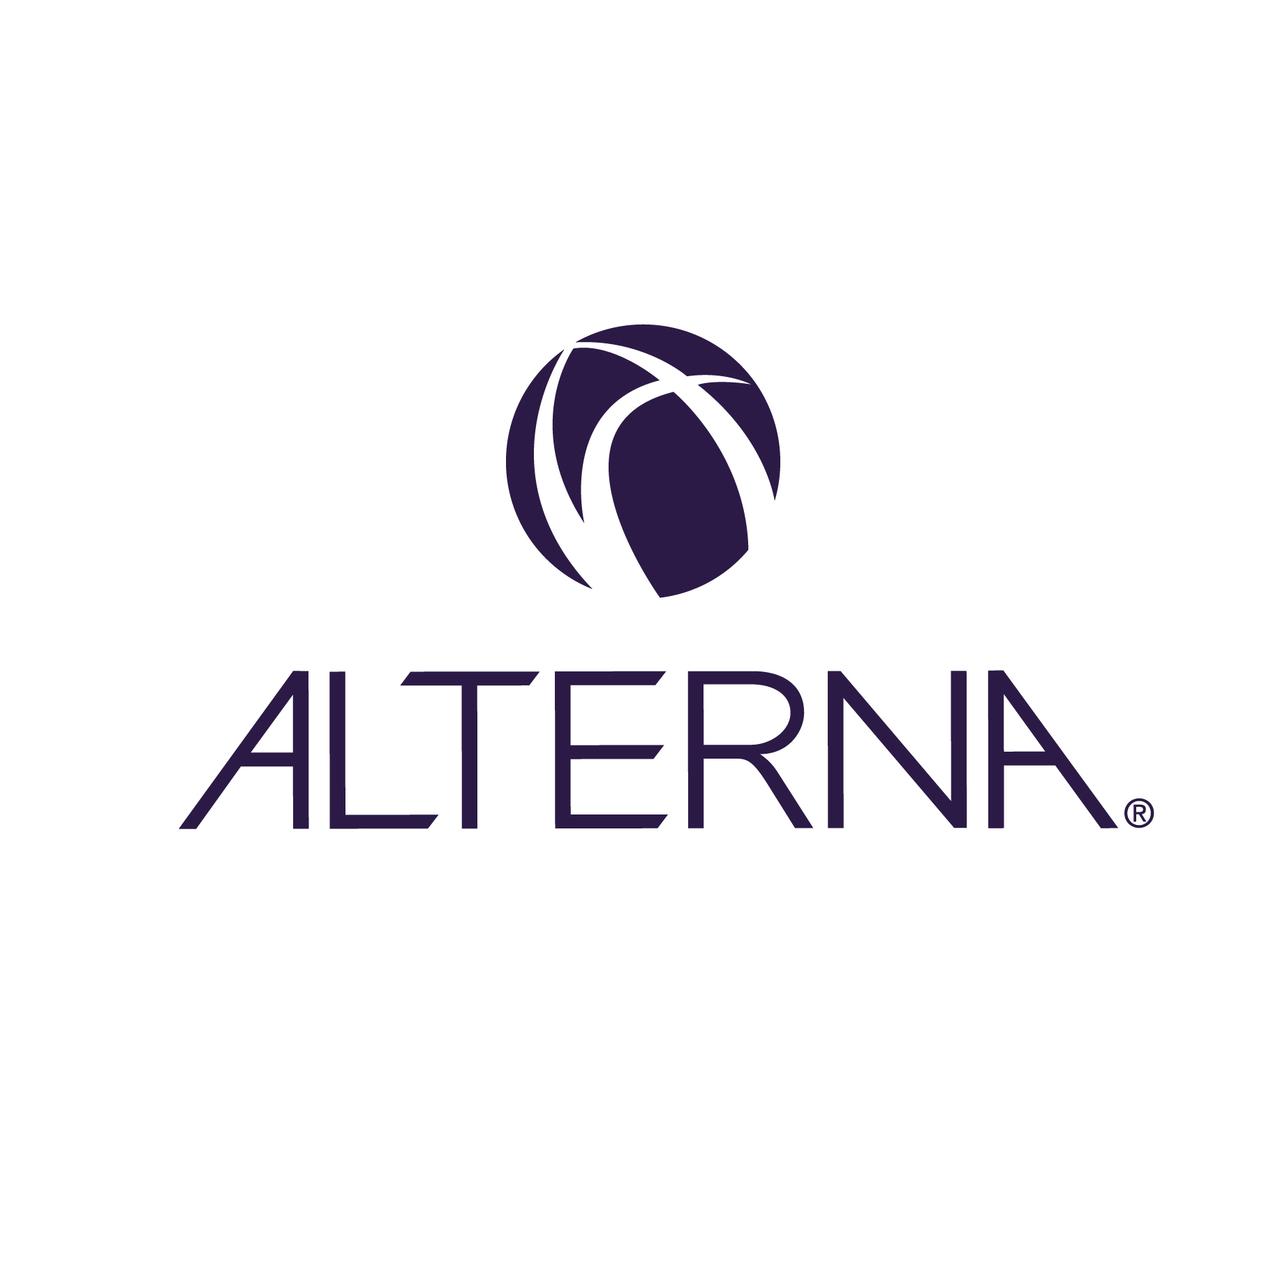 Alterna Orb 450x450 IG 300dpi wh